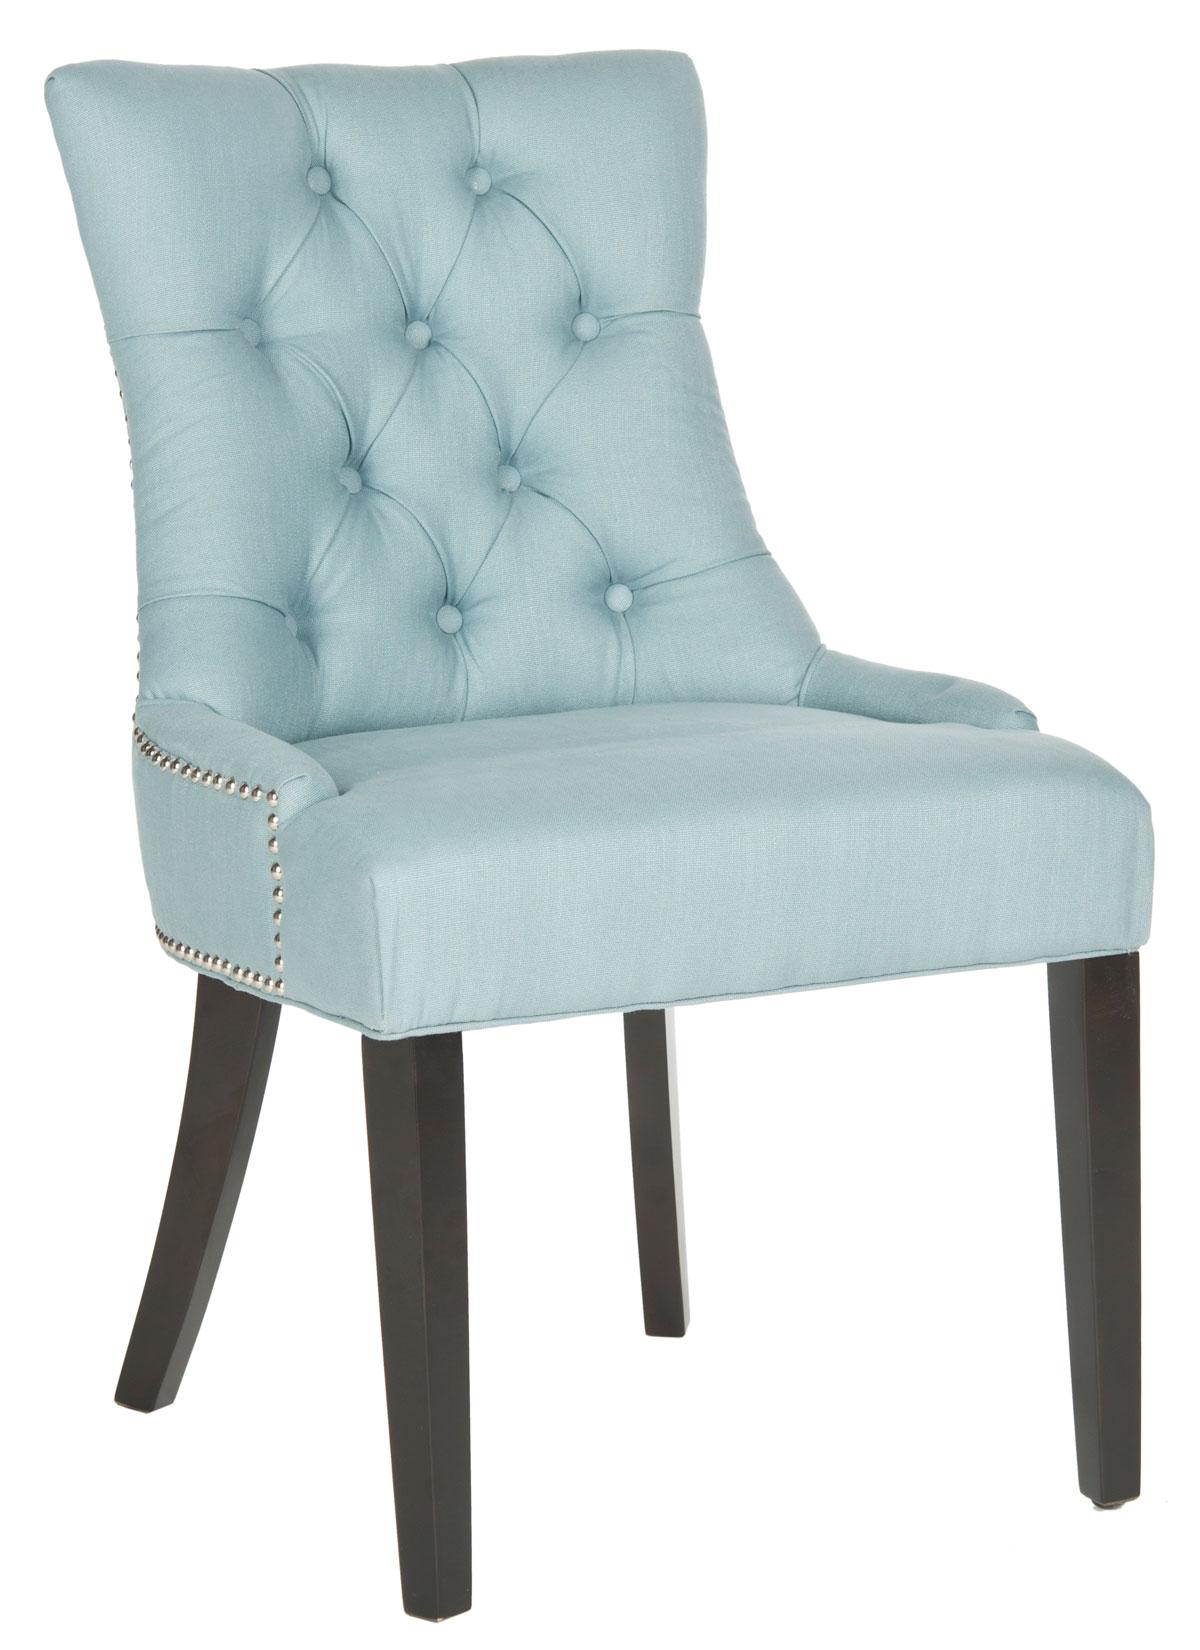 safavieh sinclair ring side chair antique oak chairs mcr4716e set2 dining furniture by